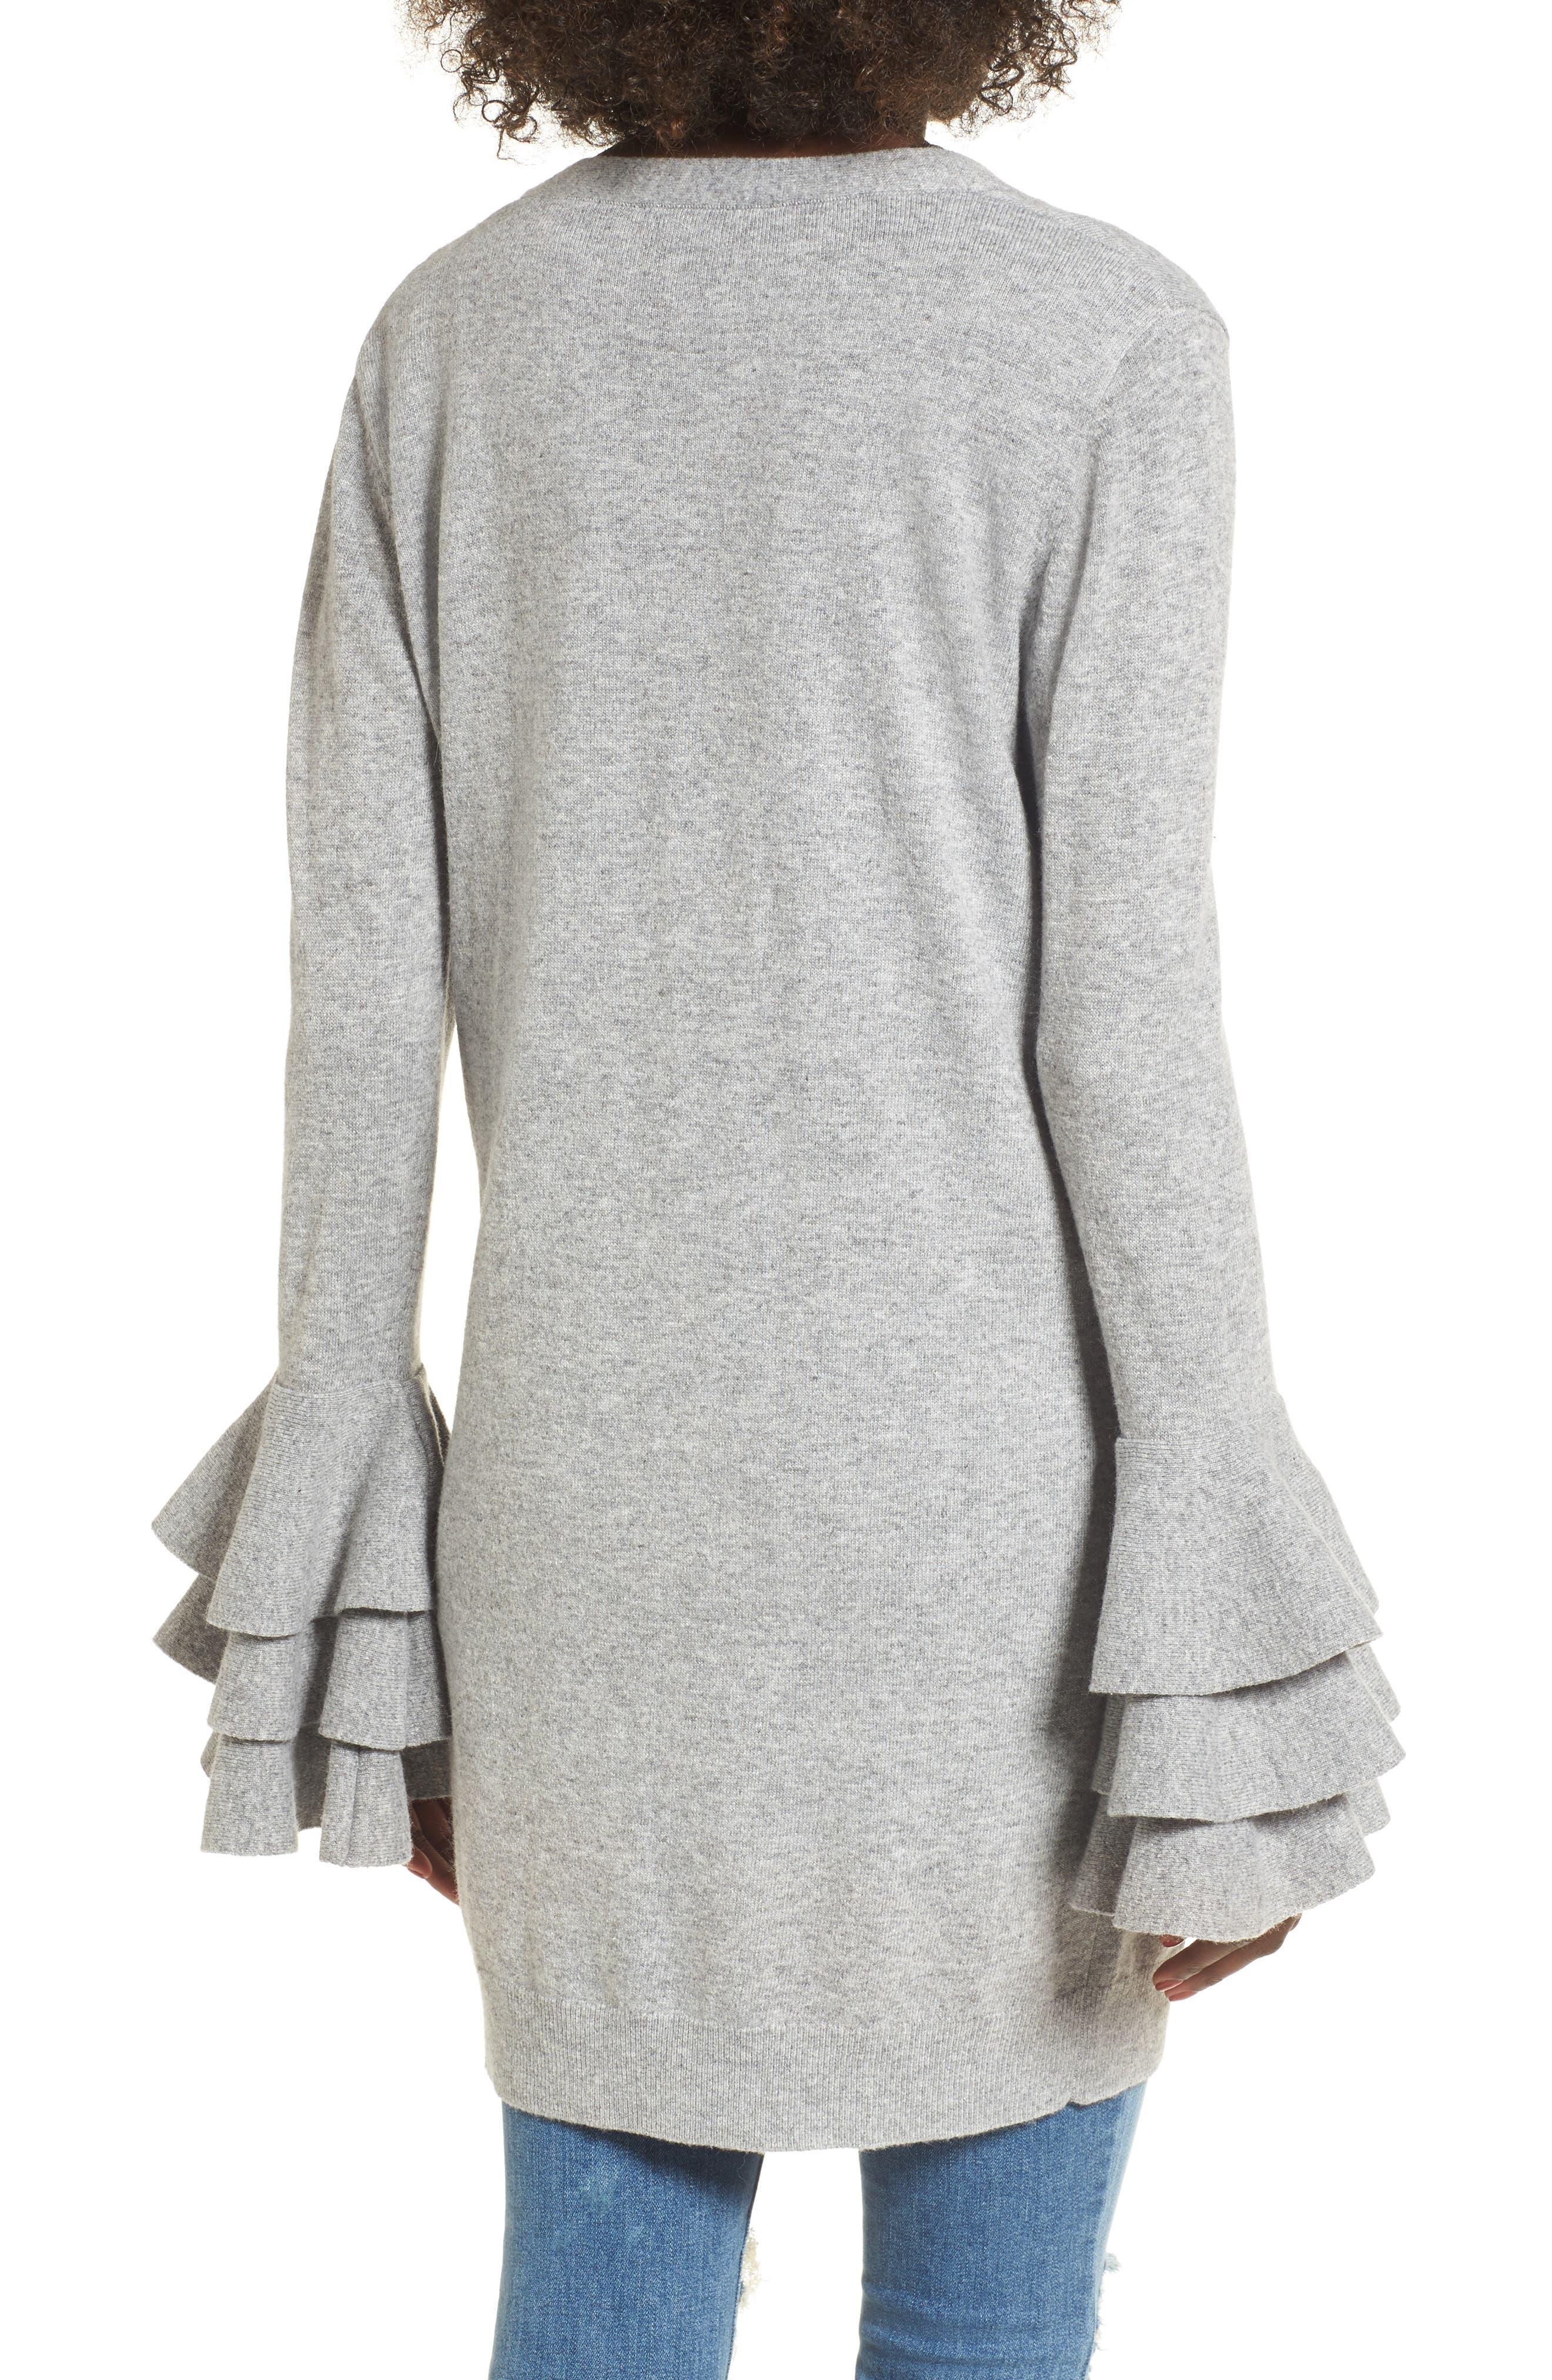 Ruffle Sleeve Longline Cardigan,                             Alternate thumbnail 2, color,                             Grey